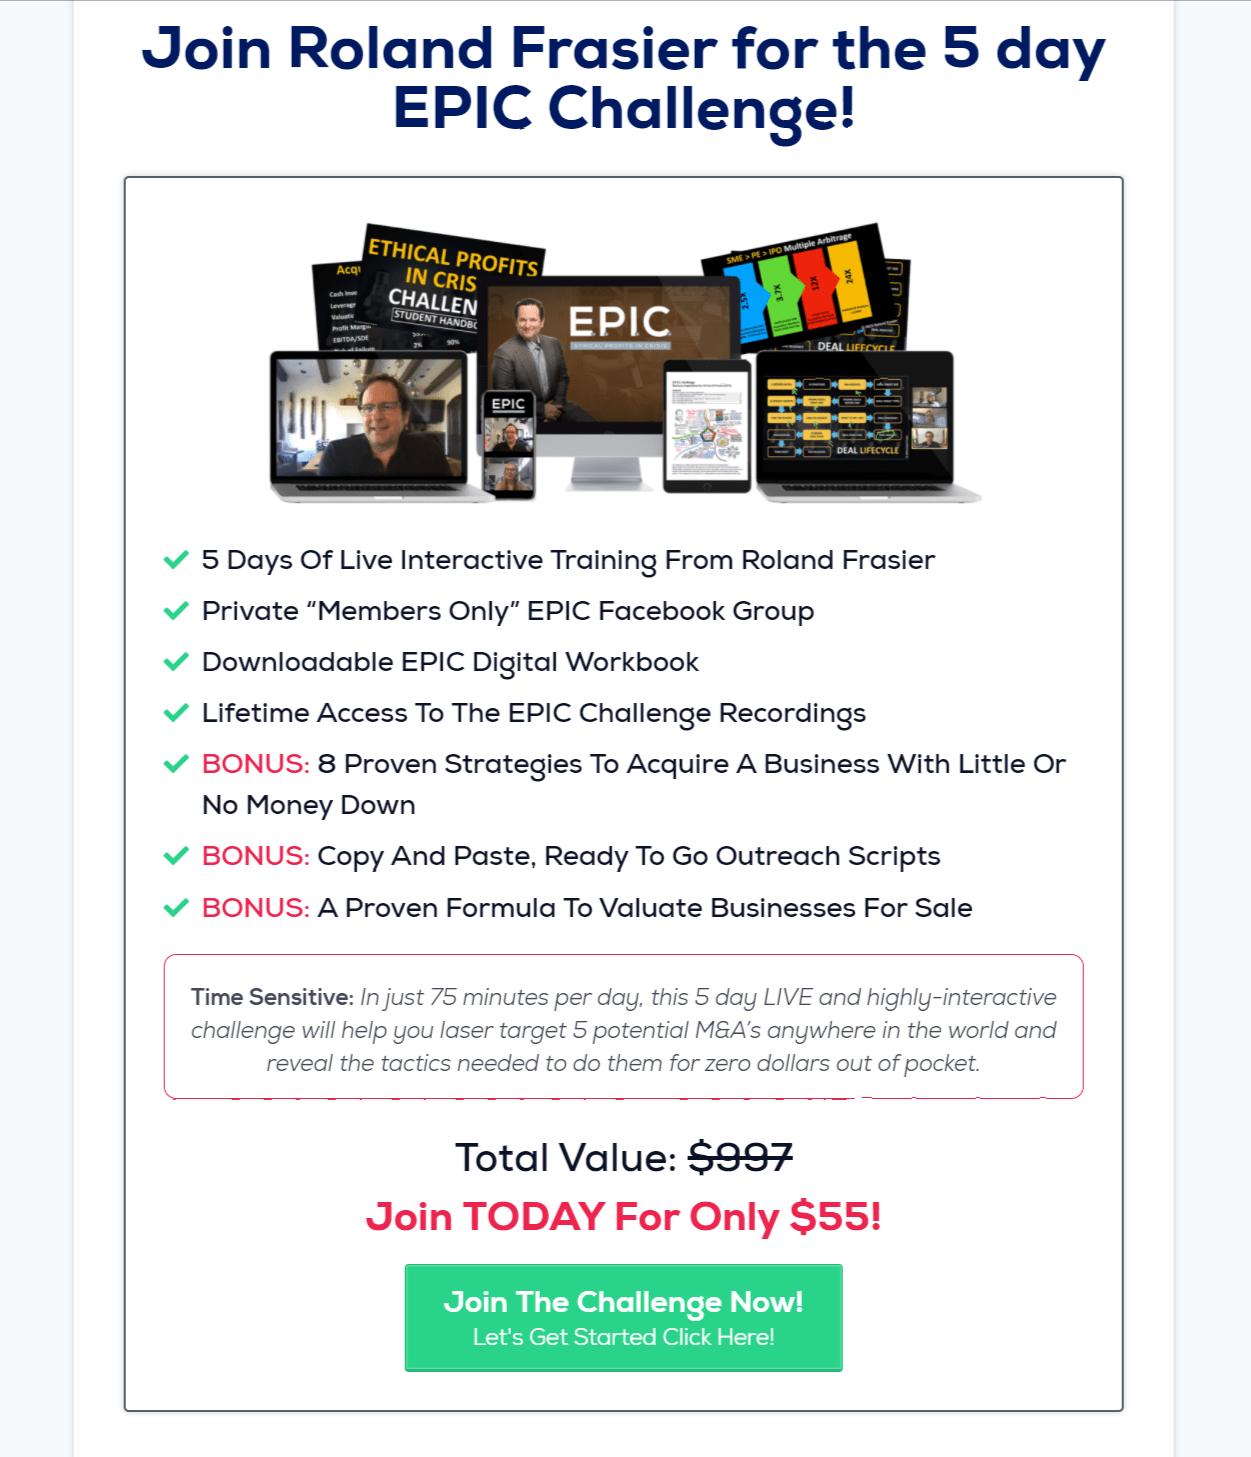 Ronald Fraiser 5 day challenge- EPIC Challenge